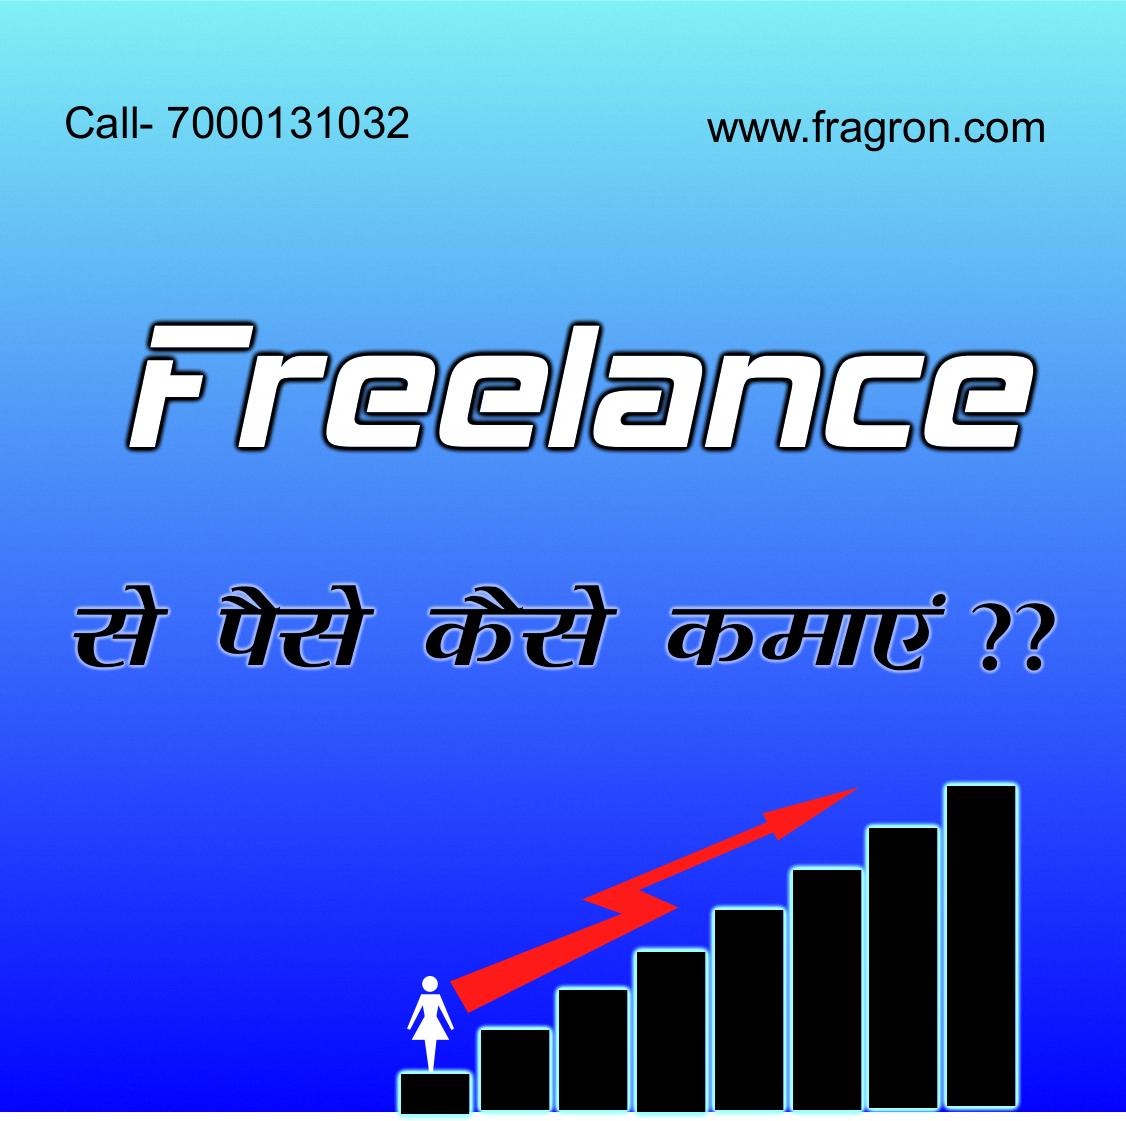 Freelance Se Paise Kaise Kamaye  – फ्रीलॅन्स से पैसे कैसे कमाए ?